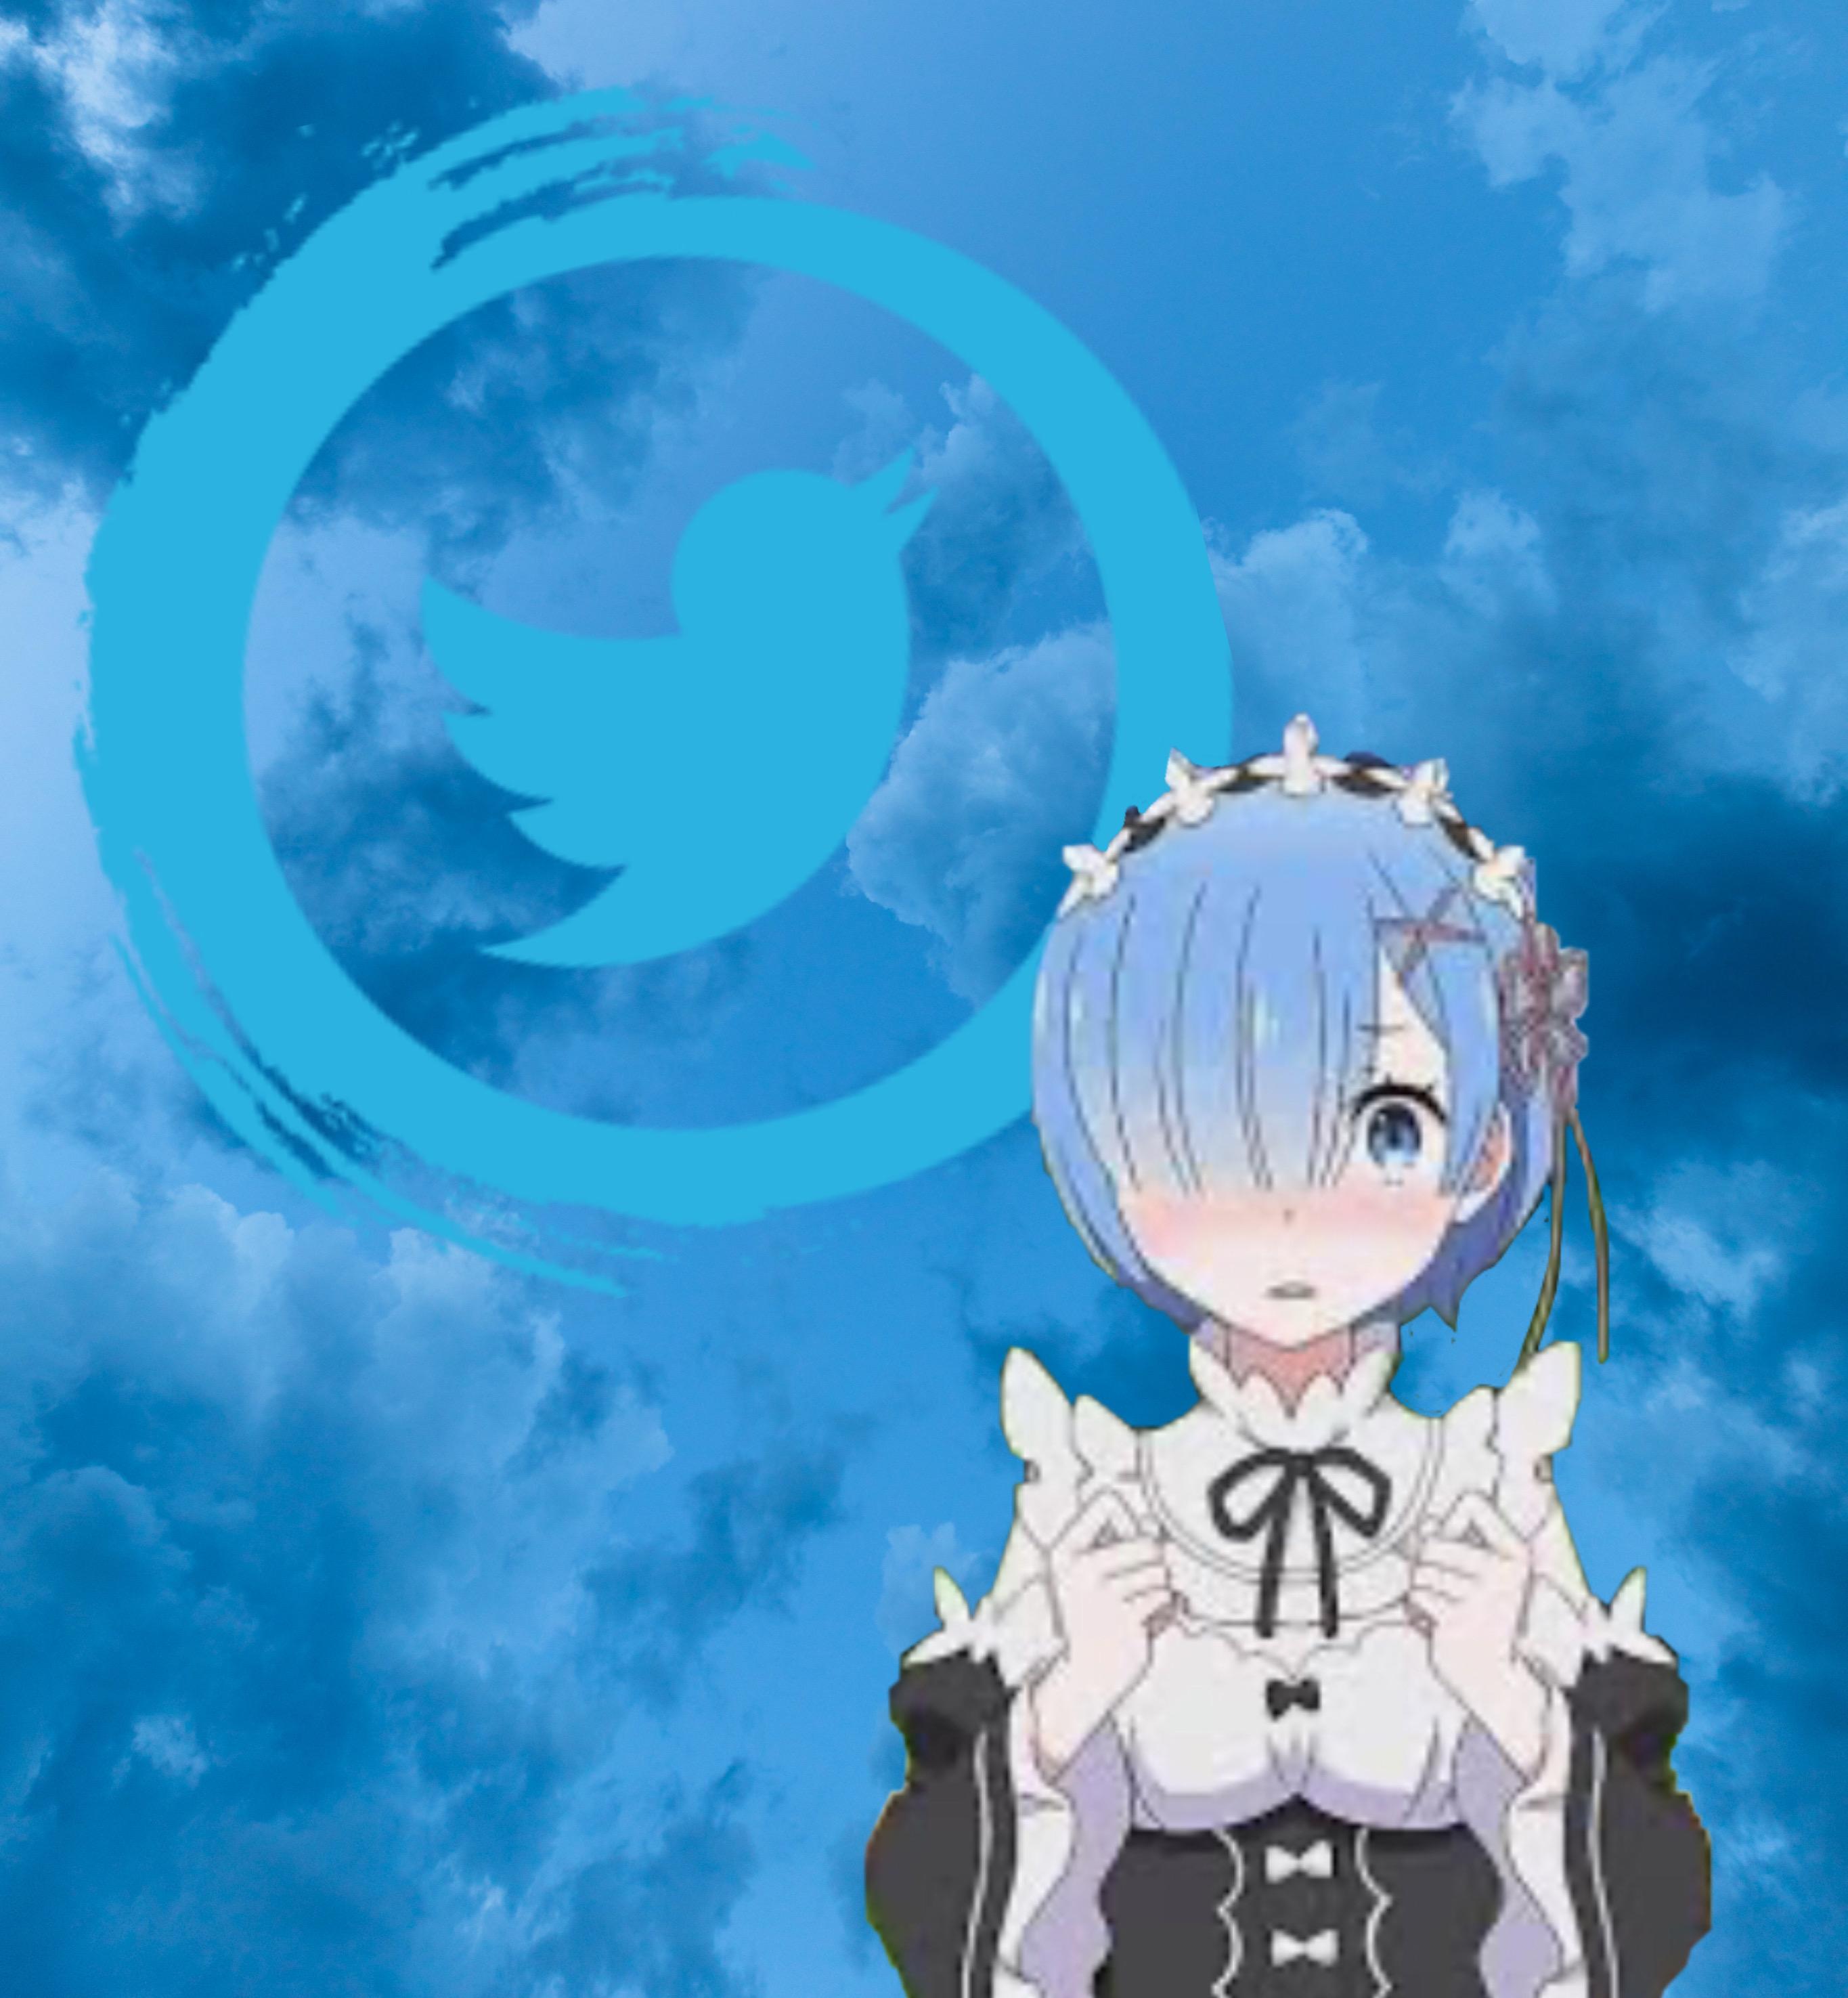 Anime Rezero Heres A Twiter Image By Dane